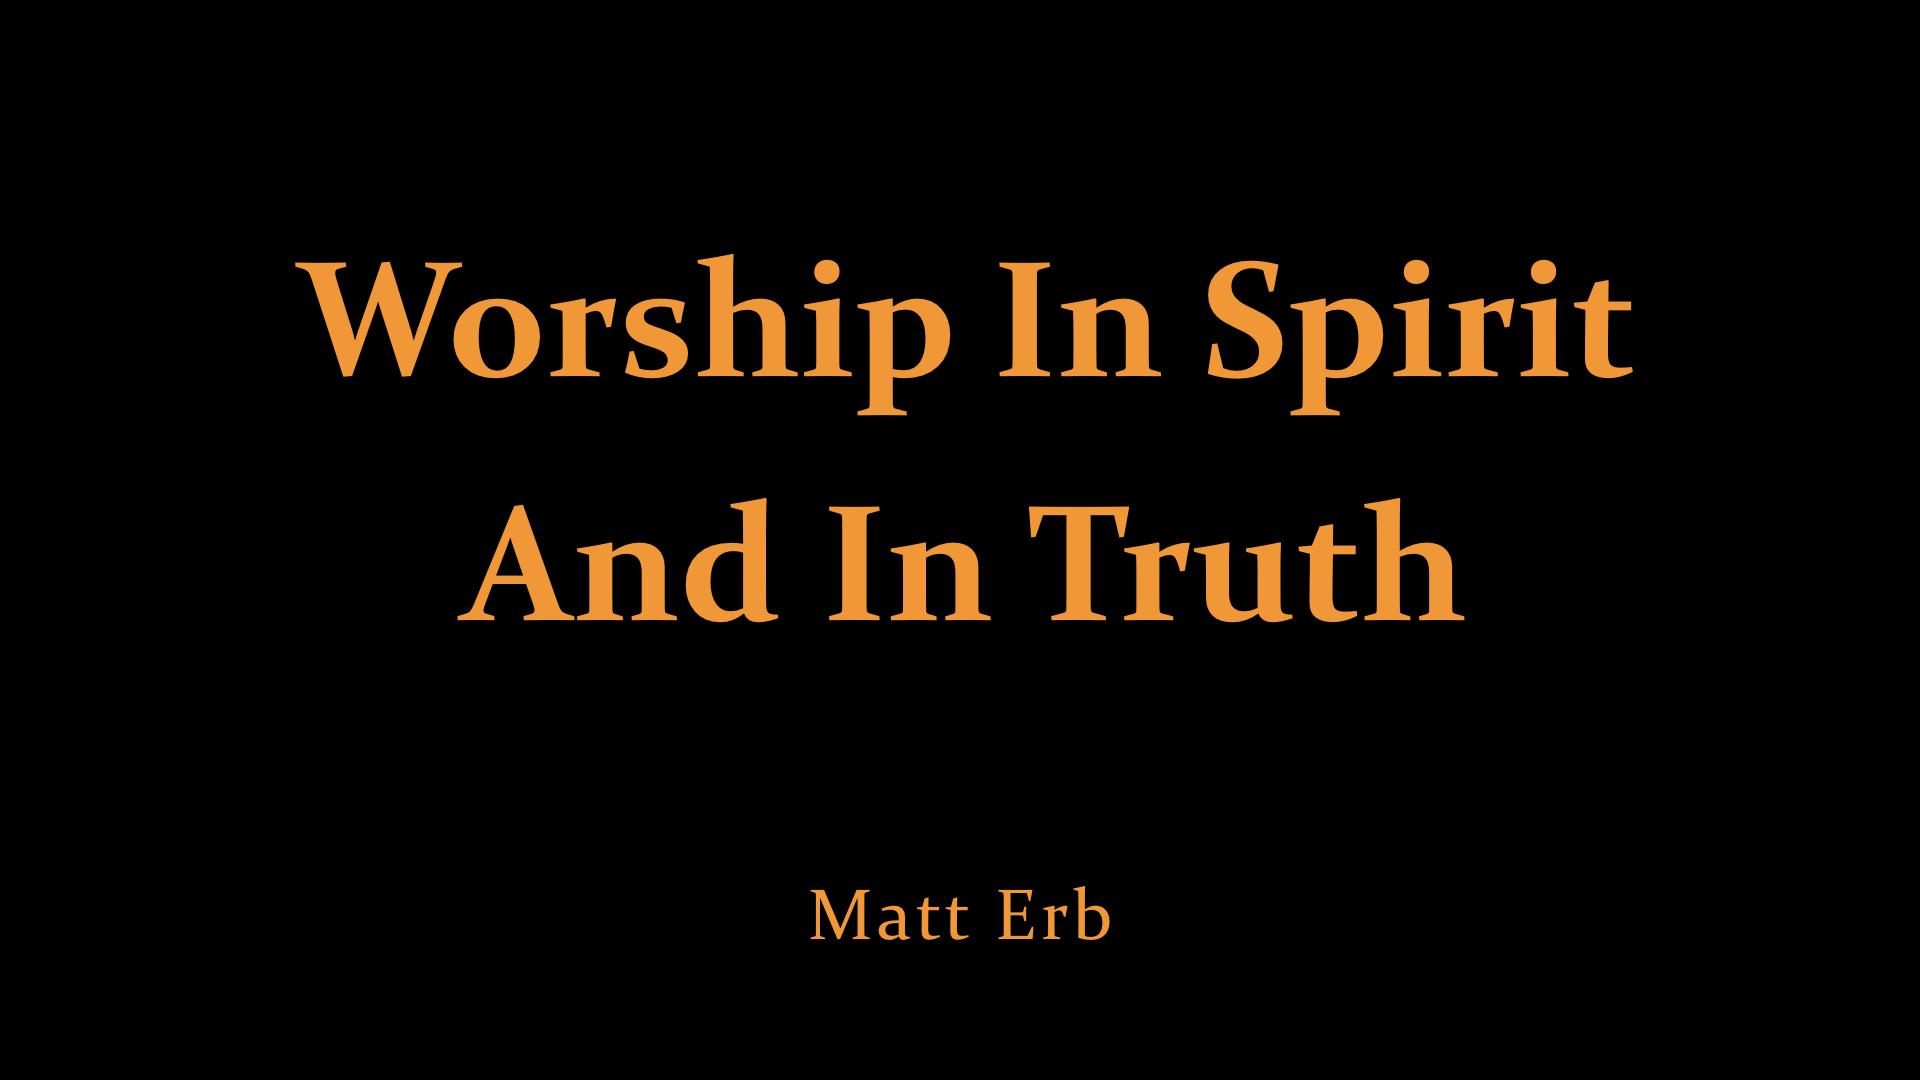 Matt Erb - Worship In Spirit And In Truth.jpeg